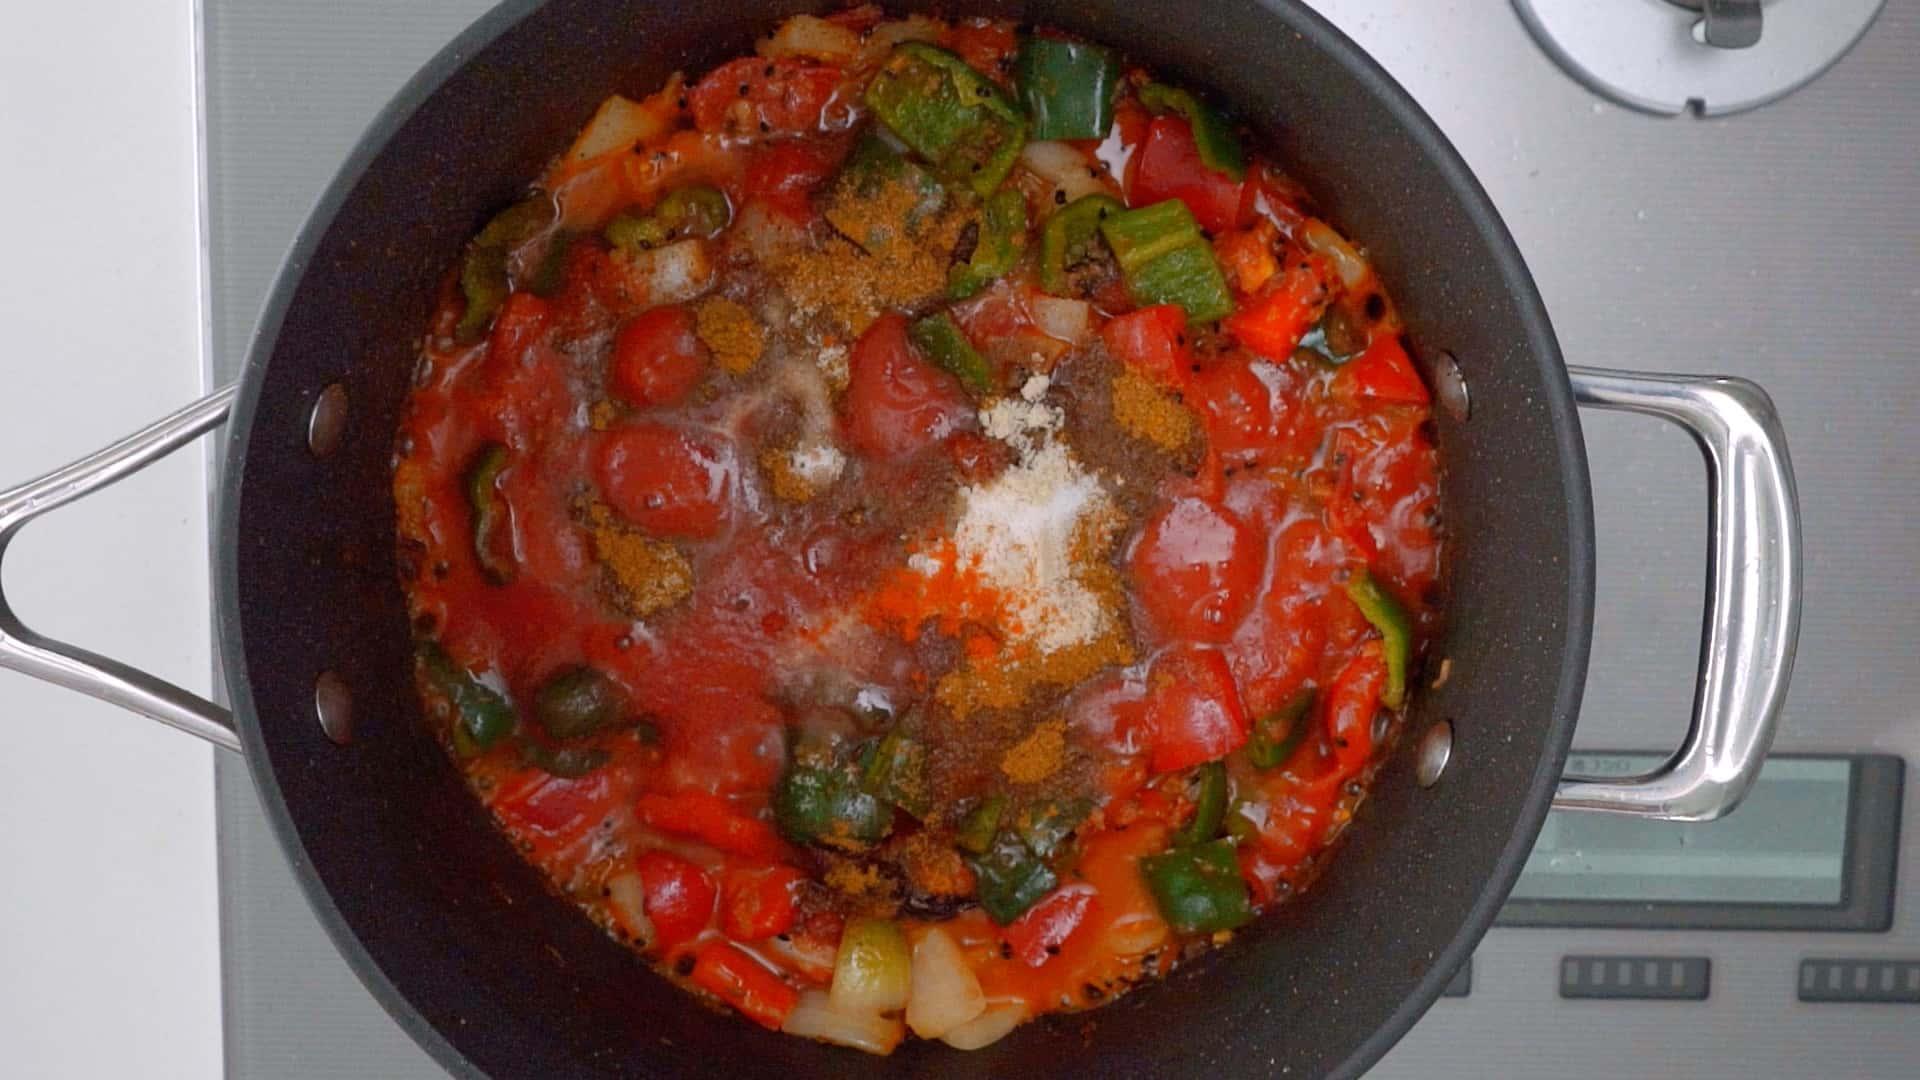 Garam masala, salt, and cayenne pepper added to Chicken Jalfrezi.